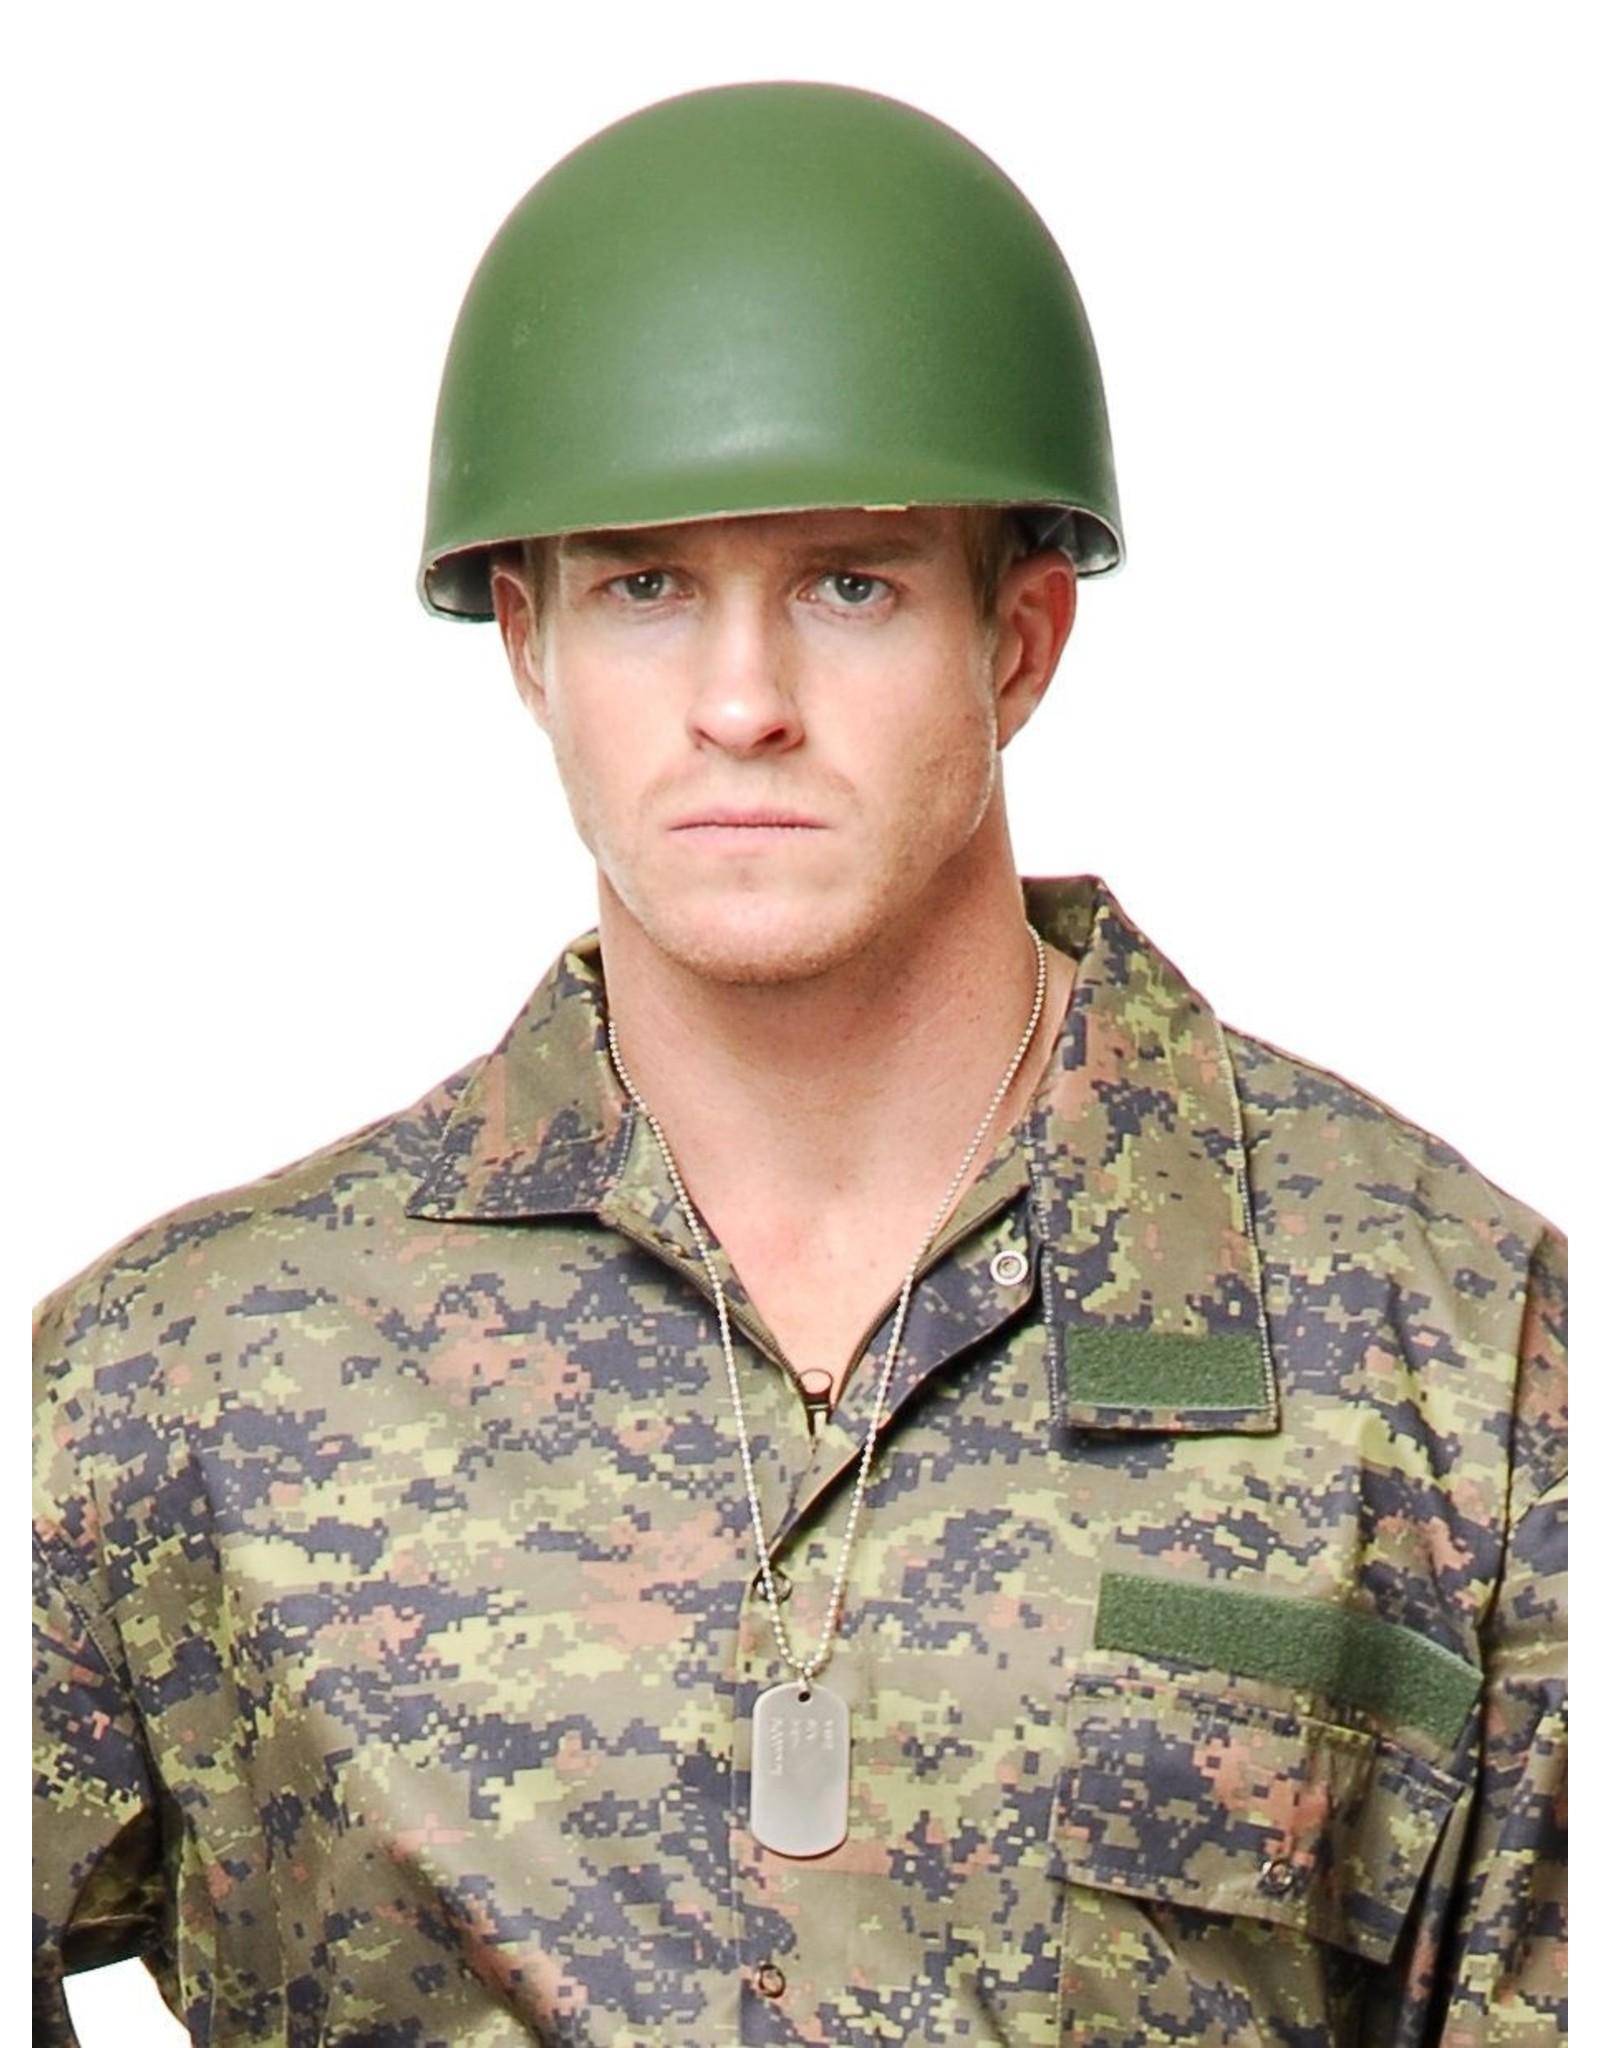 Charades Army Helmet